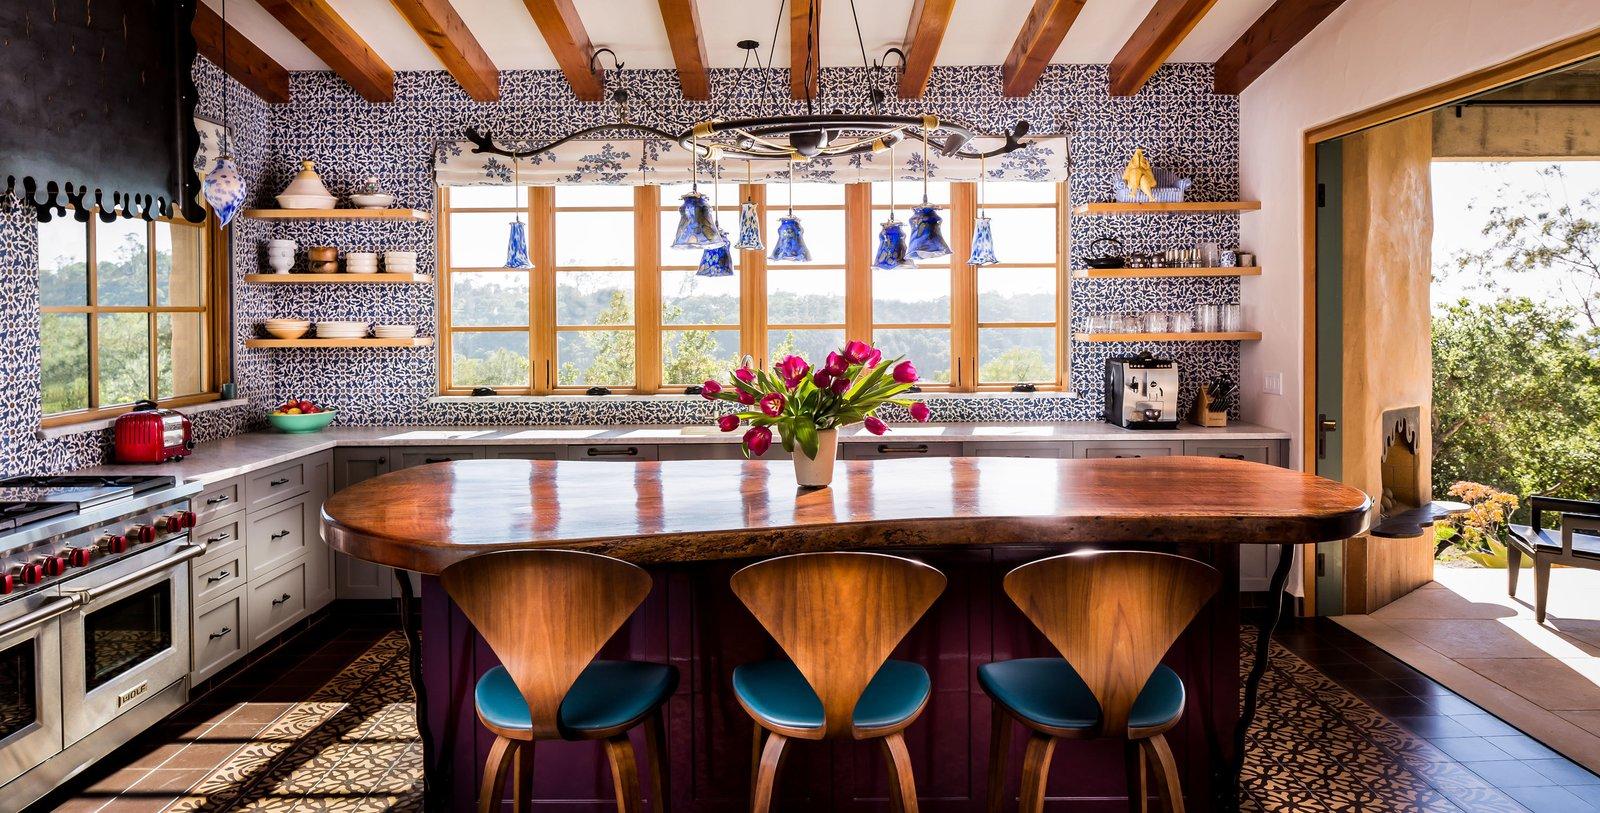 Floor using the Ablitt Flower Tile. Walls using Paul's Flower Tile.  La Roca by Jeff Shelton Architect